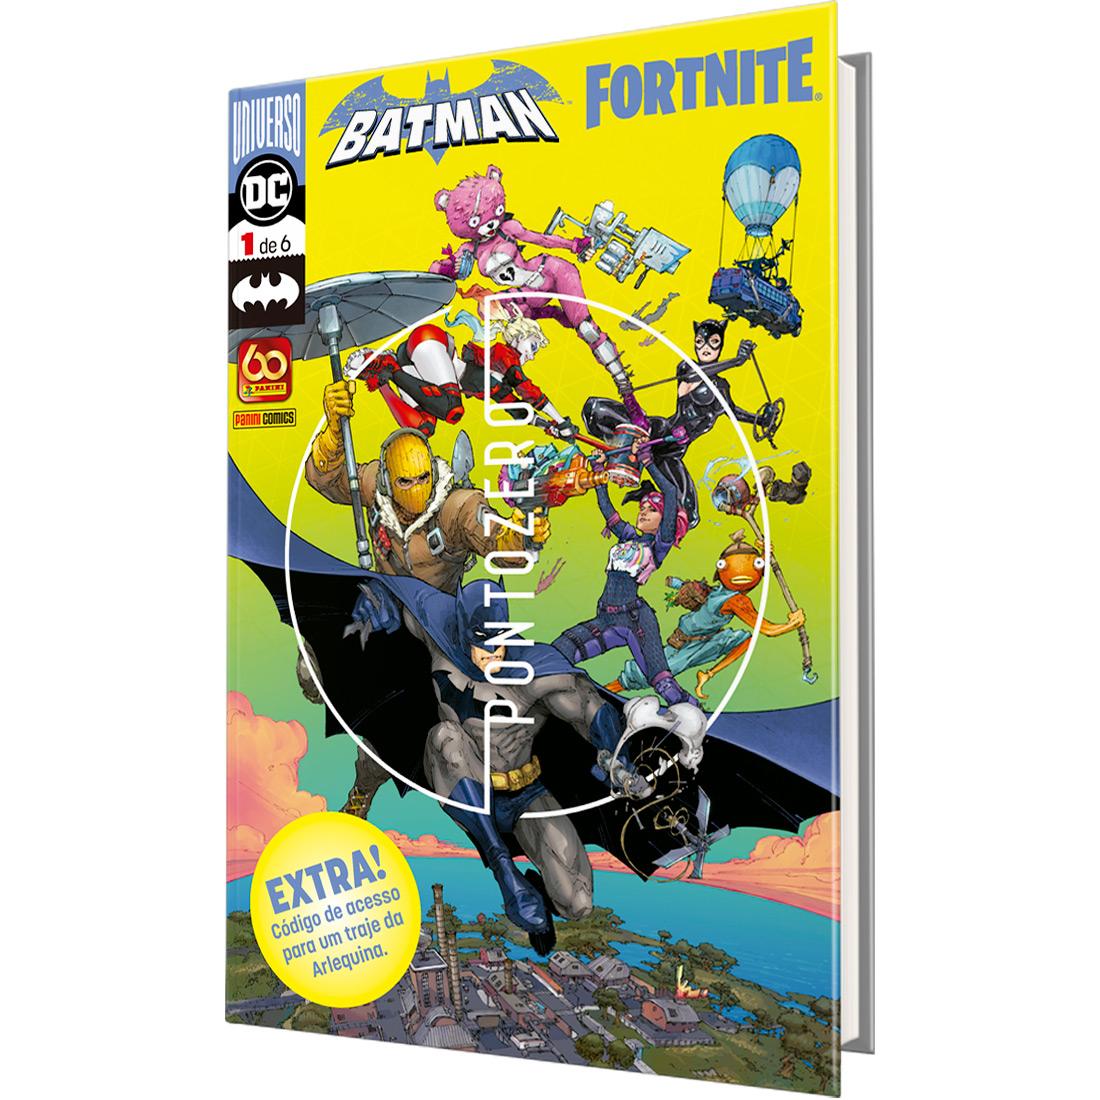 Batman - Fortnite Vol. 1